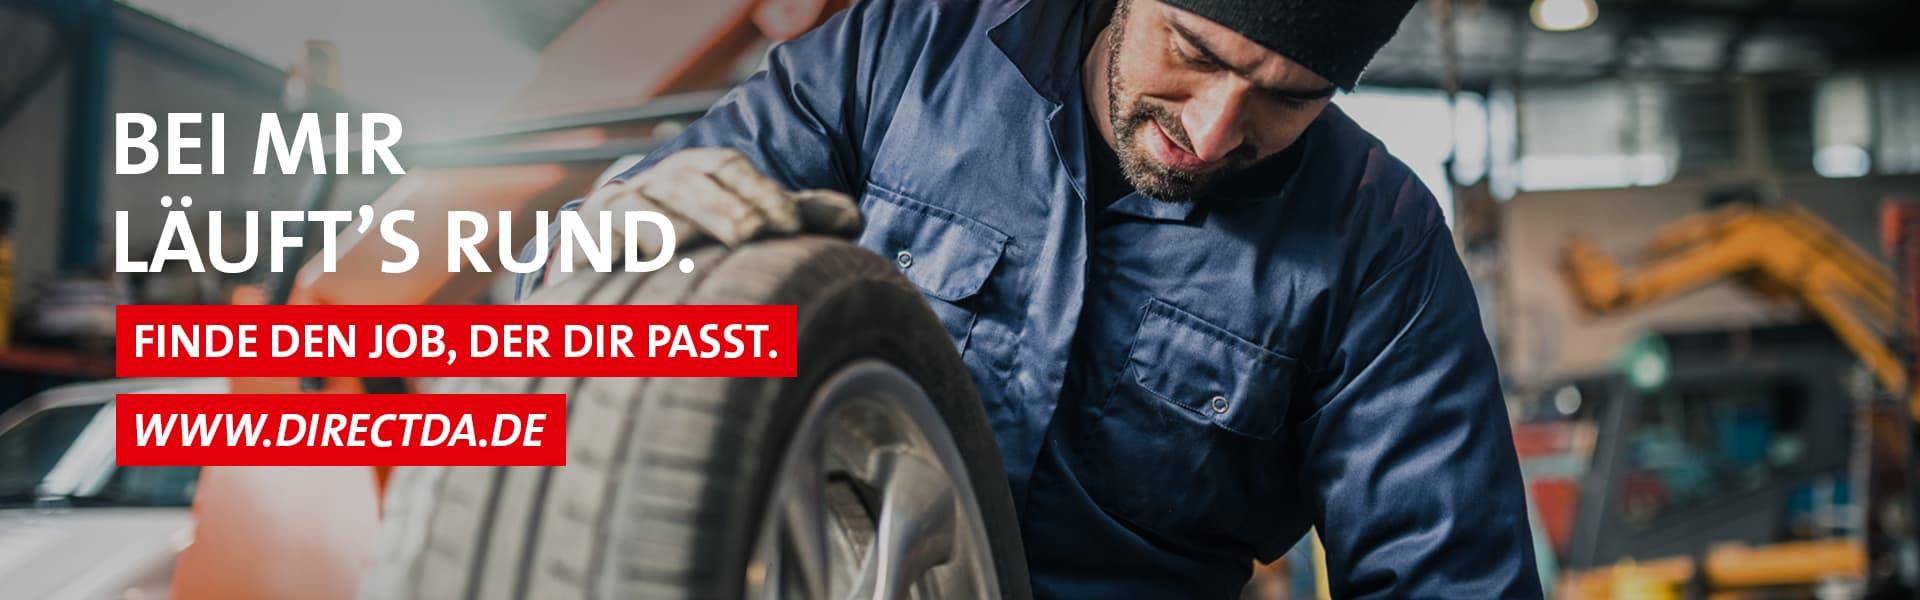 Stellenangebot KFZ Mechaniker – Finde den Job, der dir passt. www.directda.de